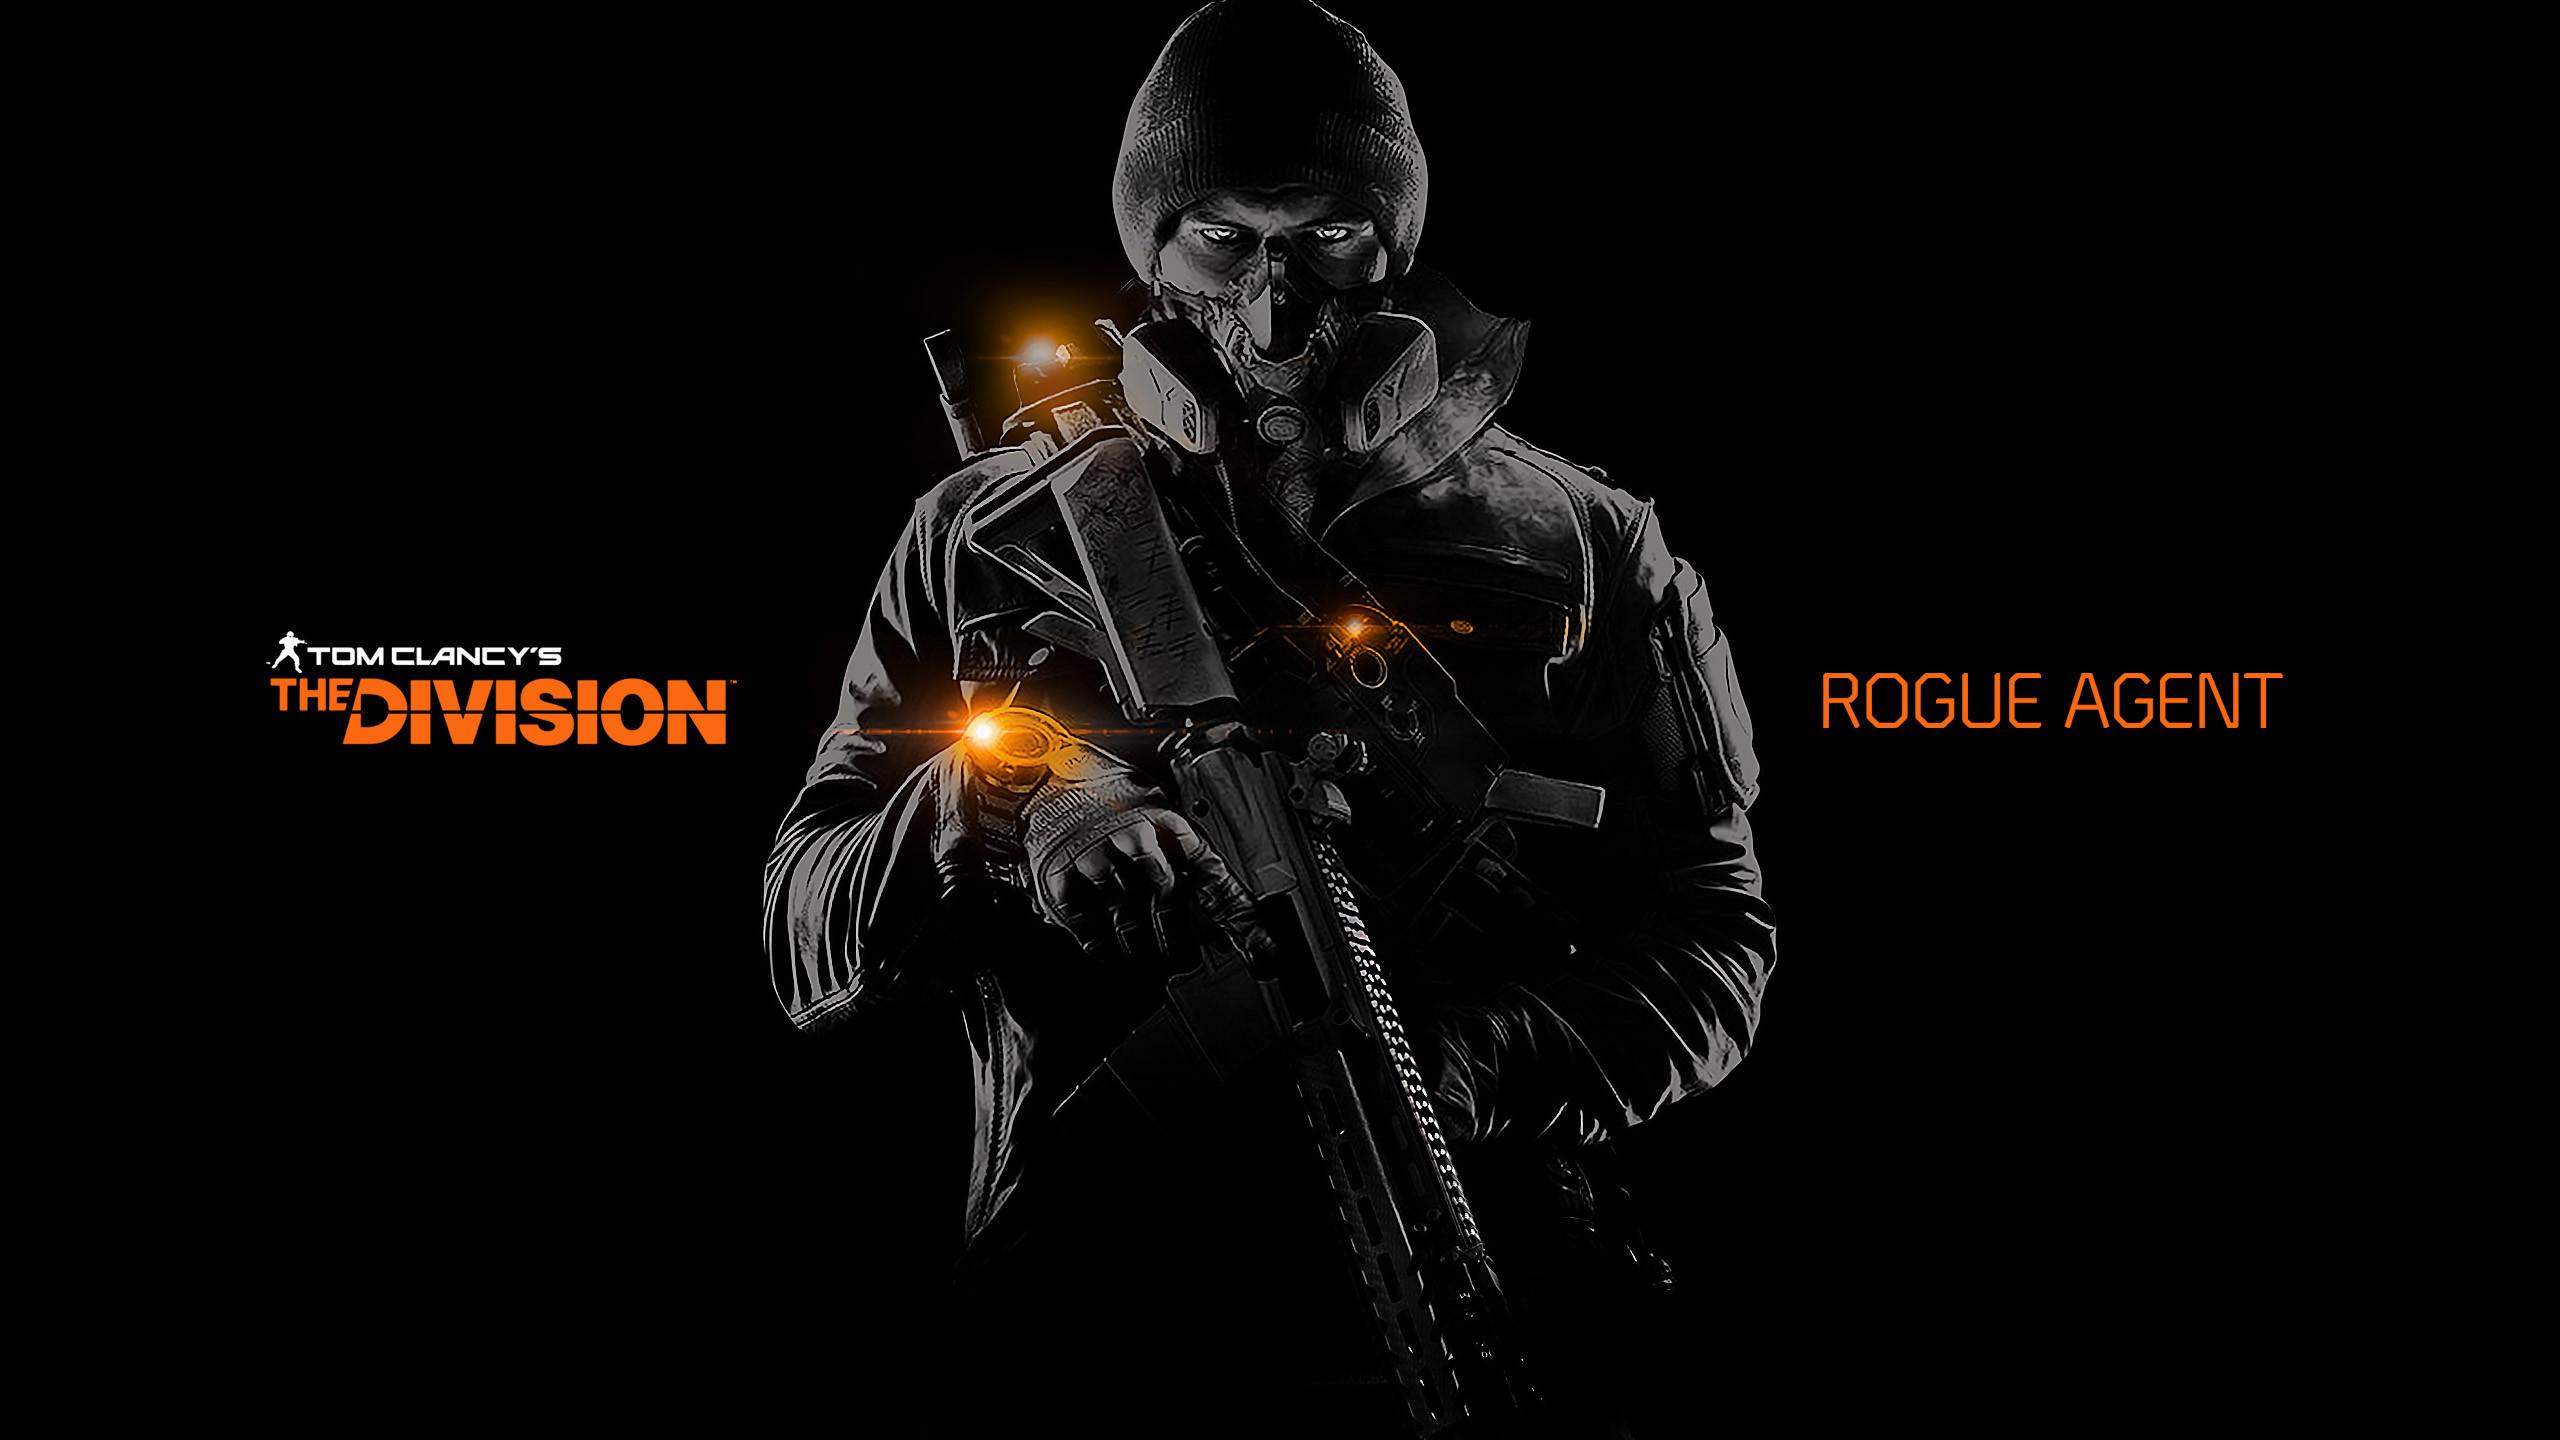 The Division Wallpaper 2 – GamerFuzion